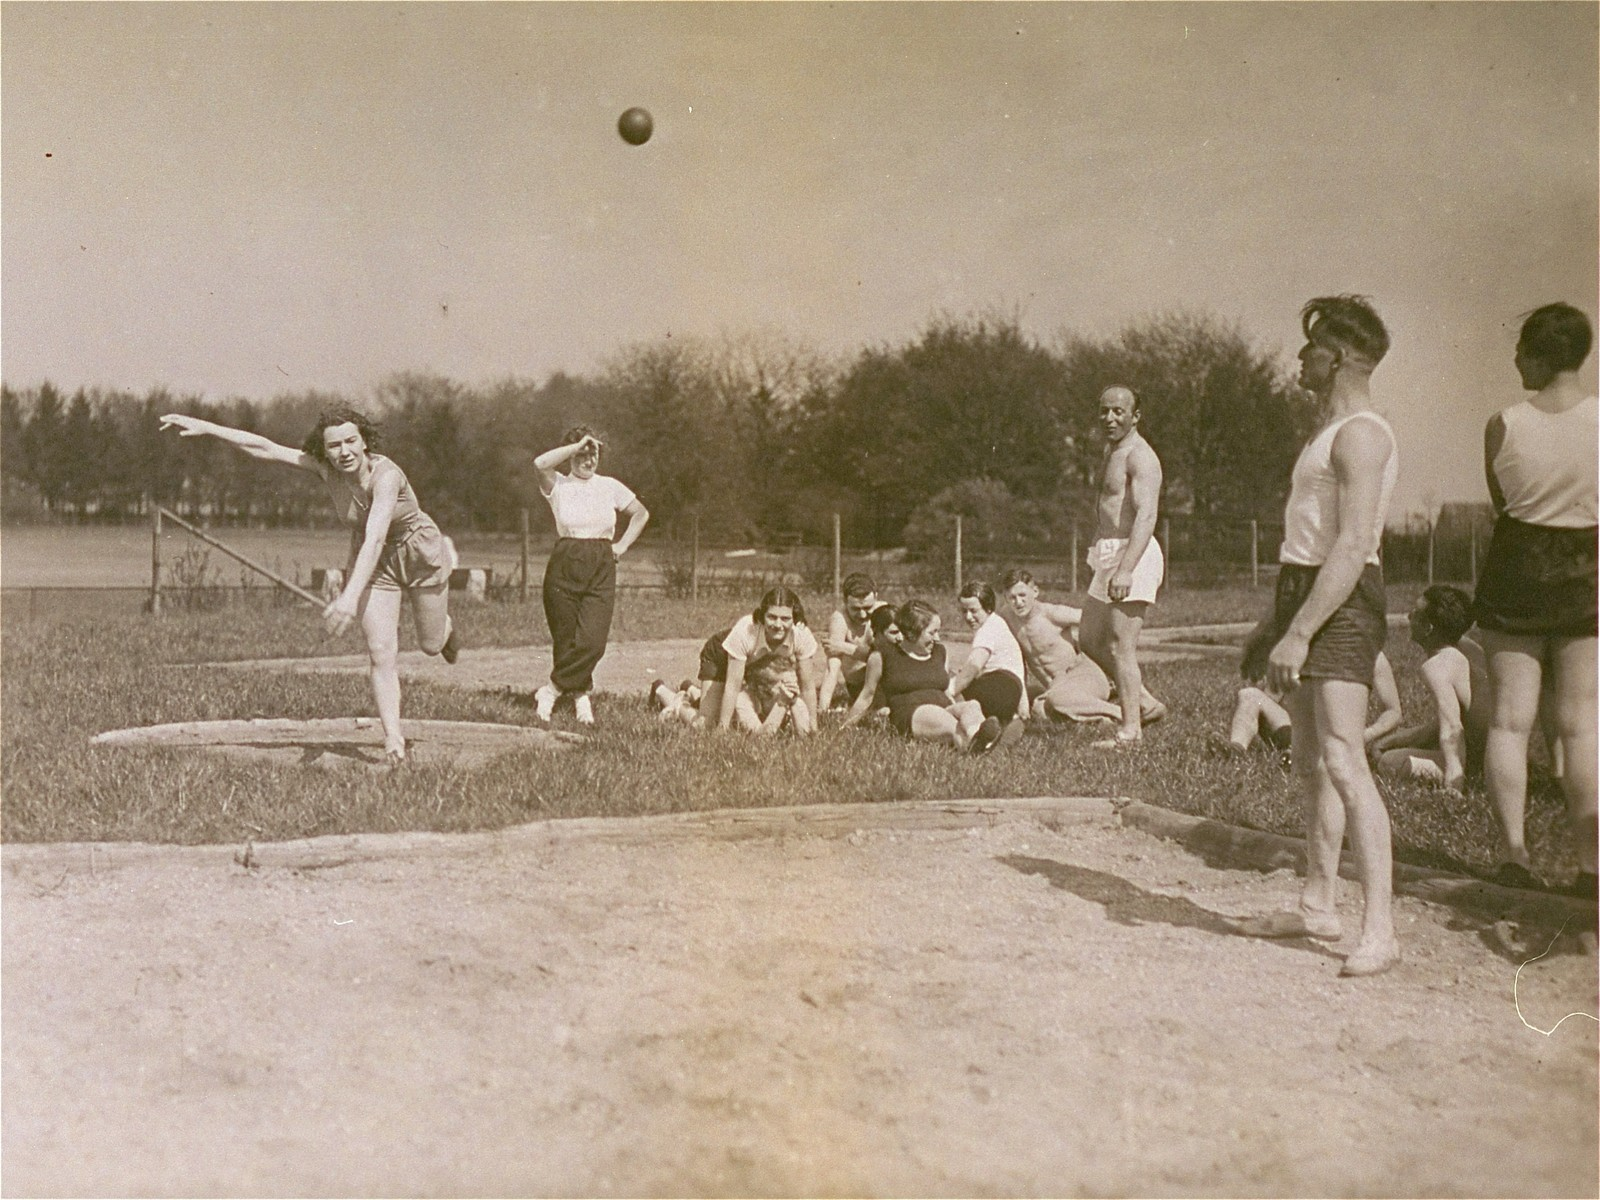 Ilse Dahl, a member of the track and field team of the Reichsbund juedischer Frontsoldaten sports club, hurls a shotput 7.10 meters.